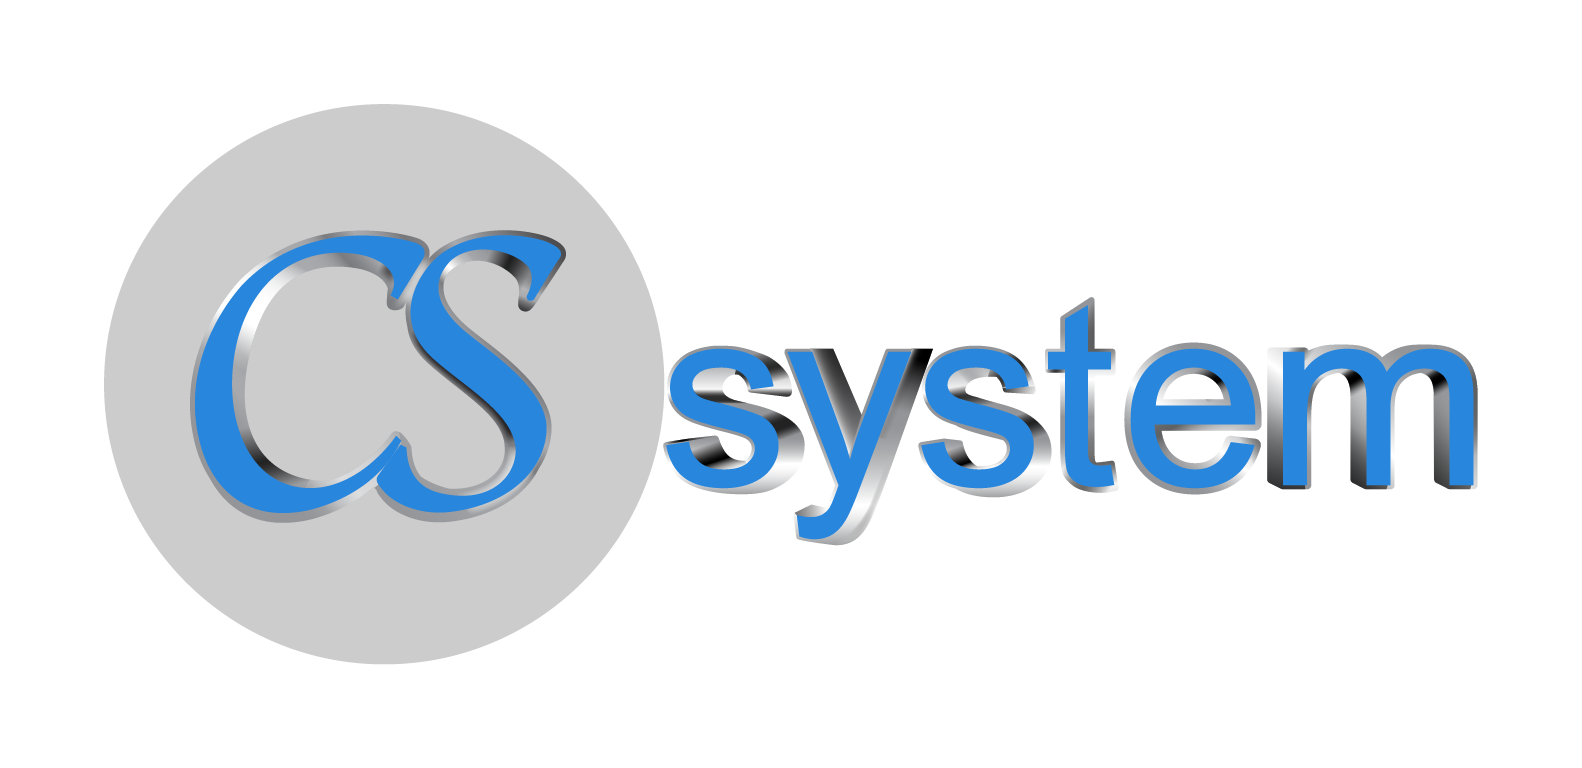 Cs system